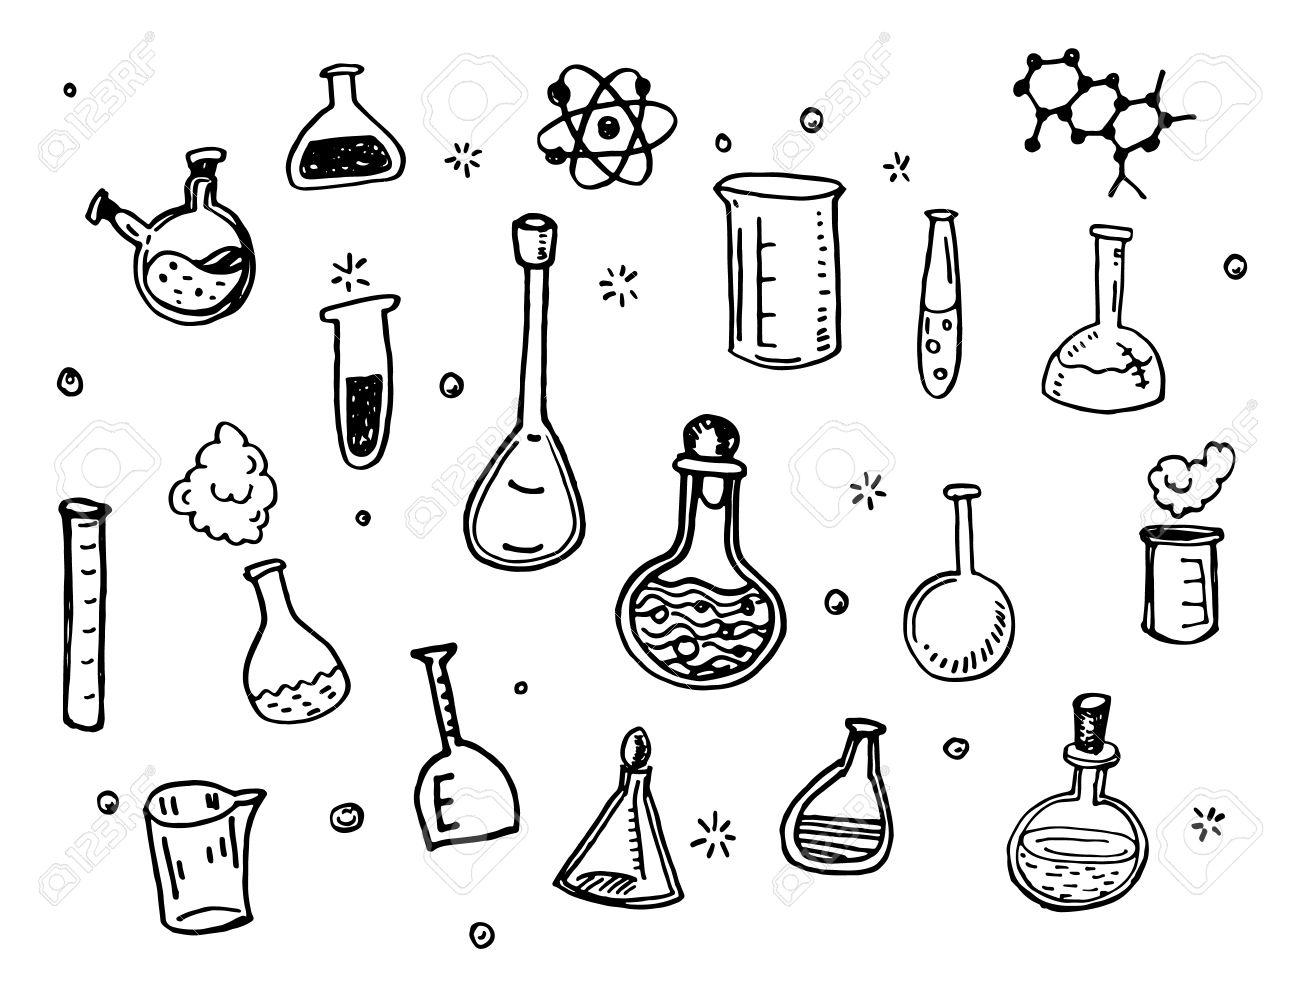 Chemical Drawing At Getdrawings